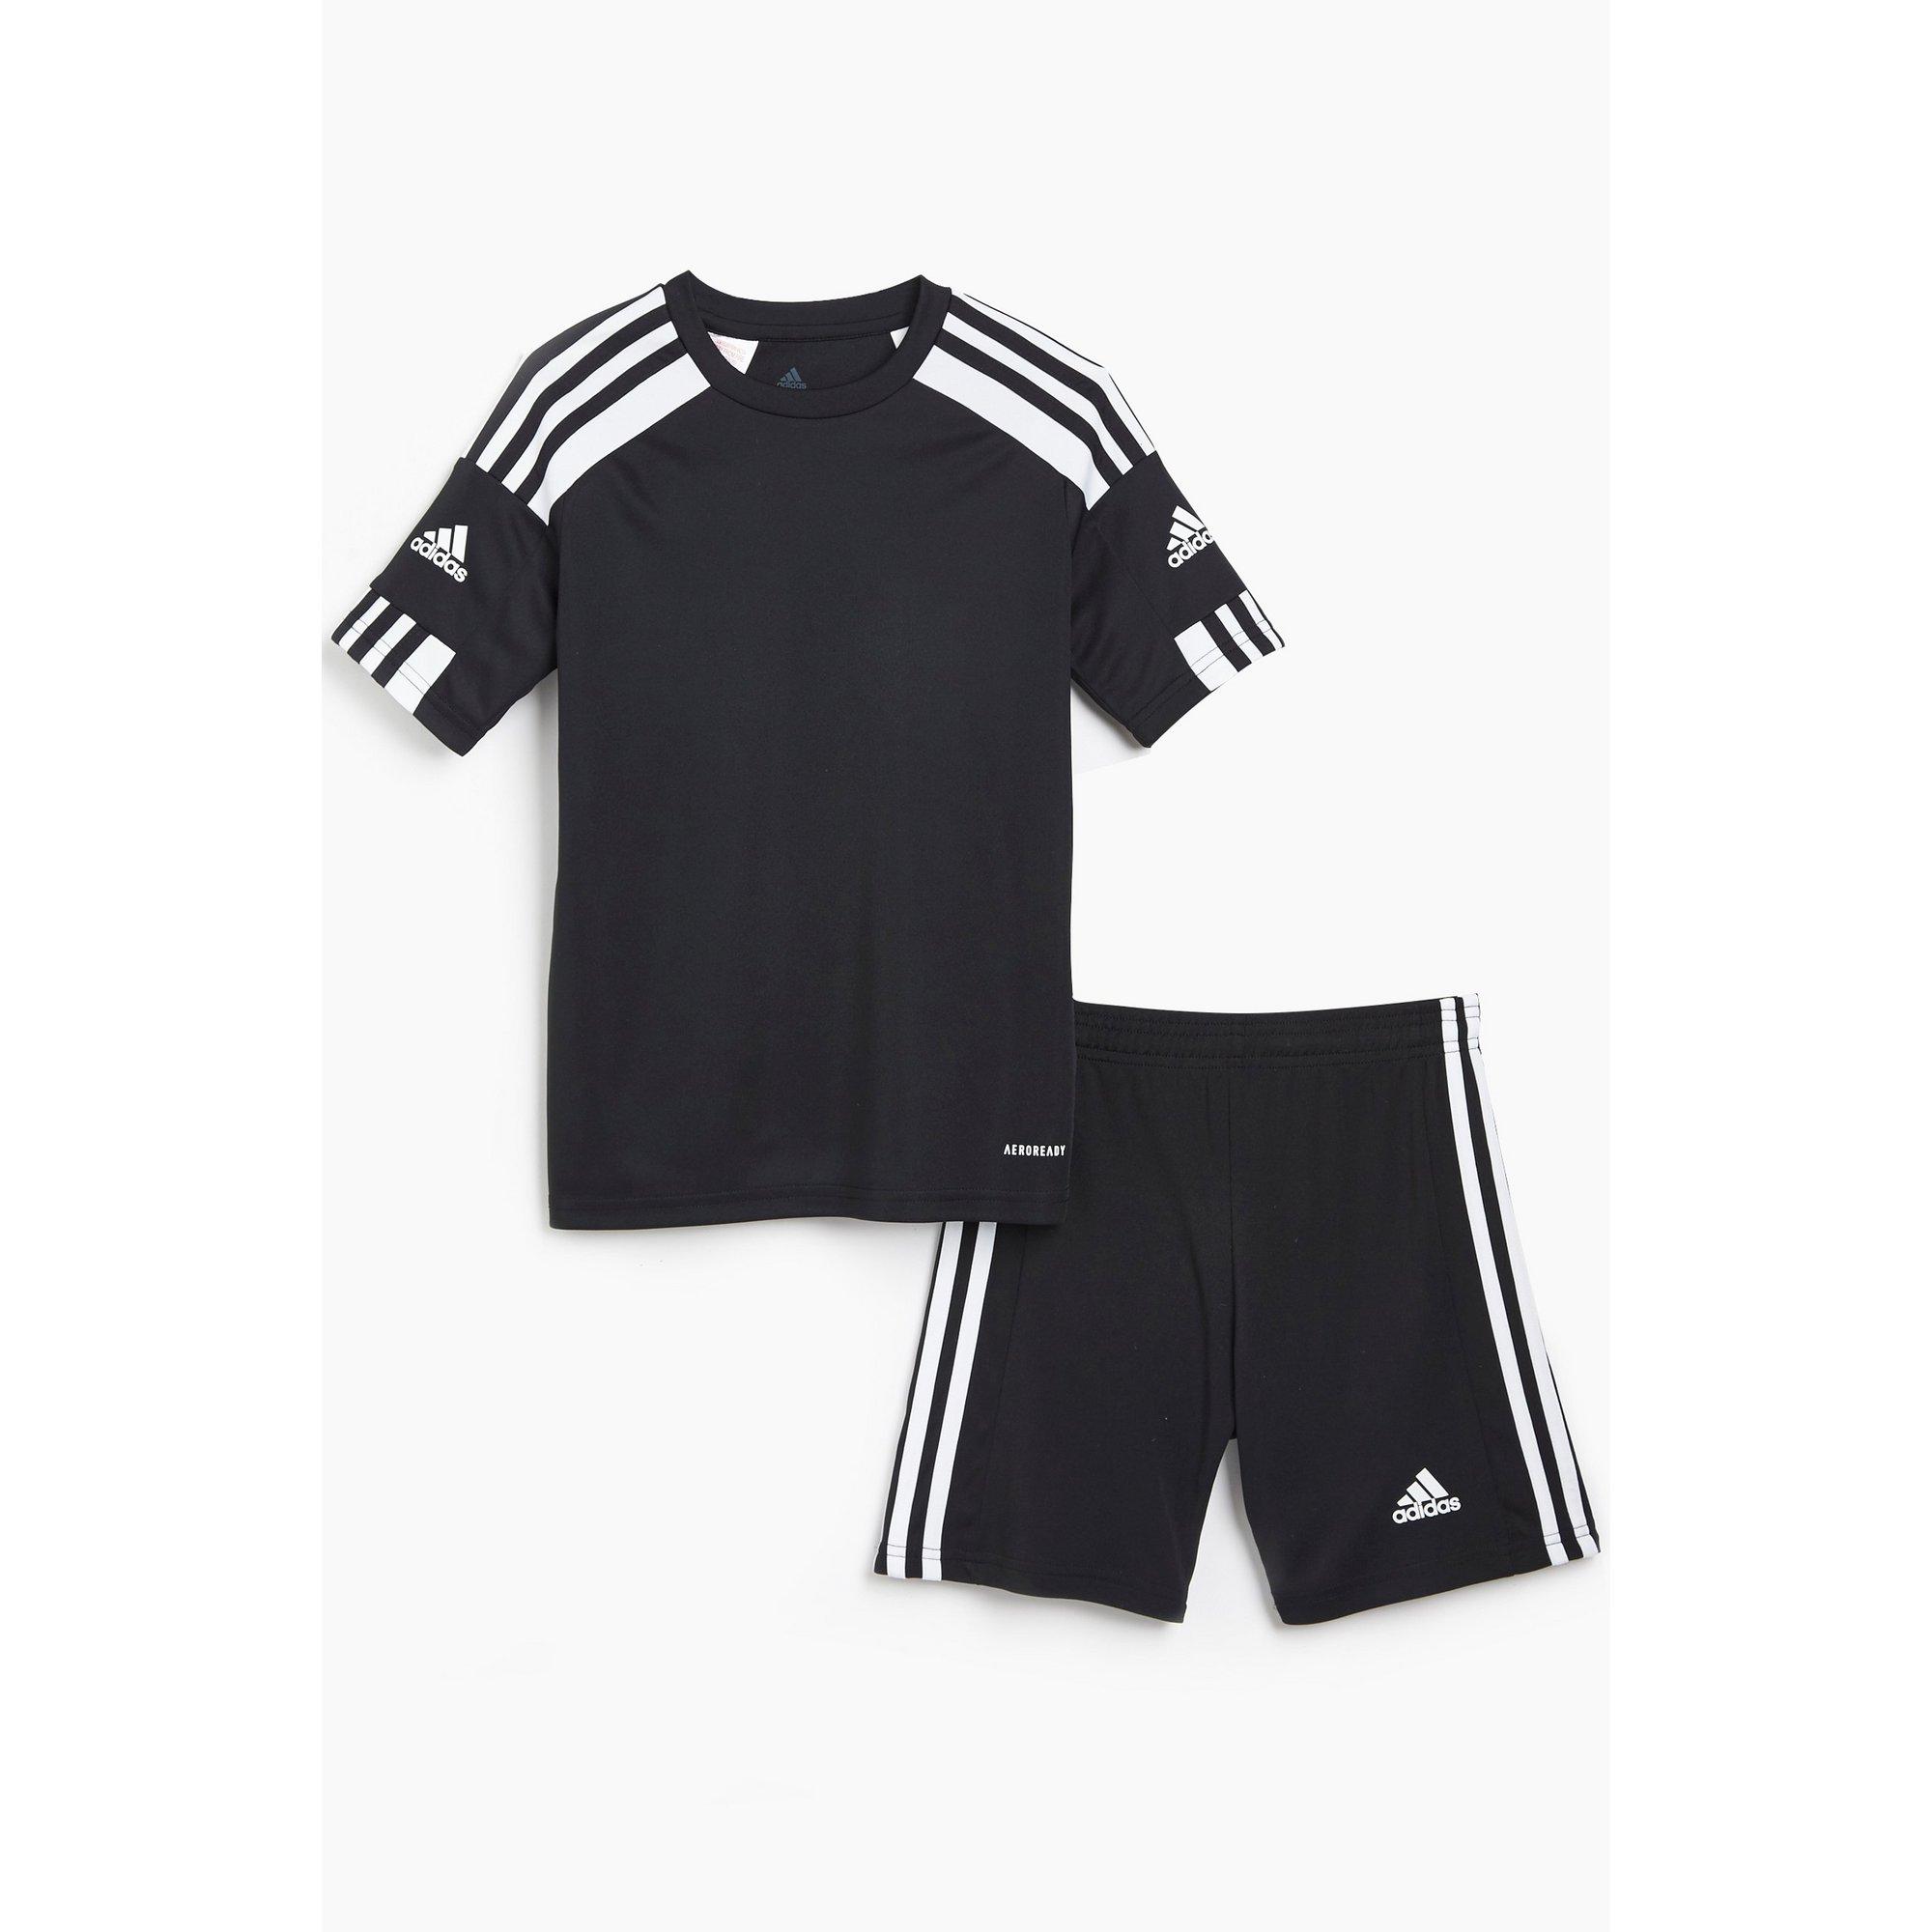 Image of Boys adidas Black Squadra T-Shirt and Short Set